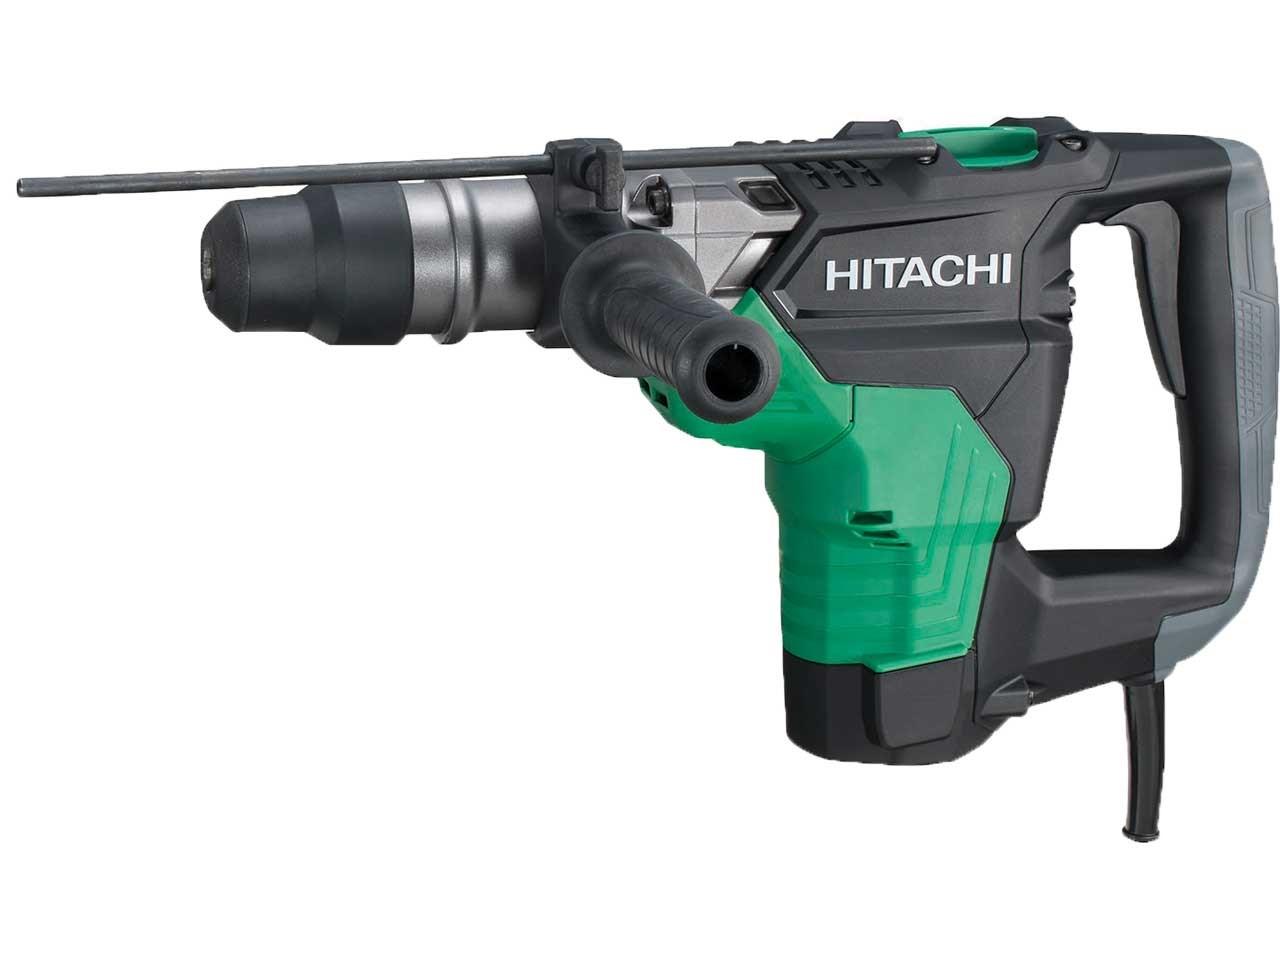 hitachi hammer drill. hitachi hammer drill